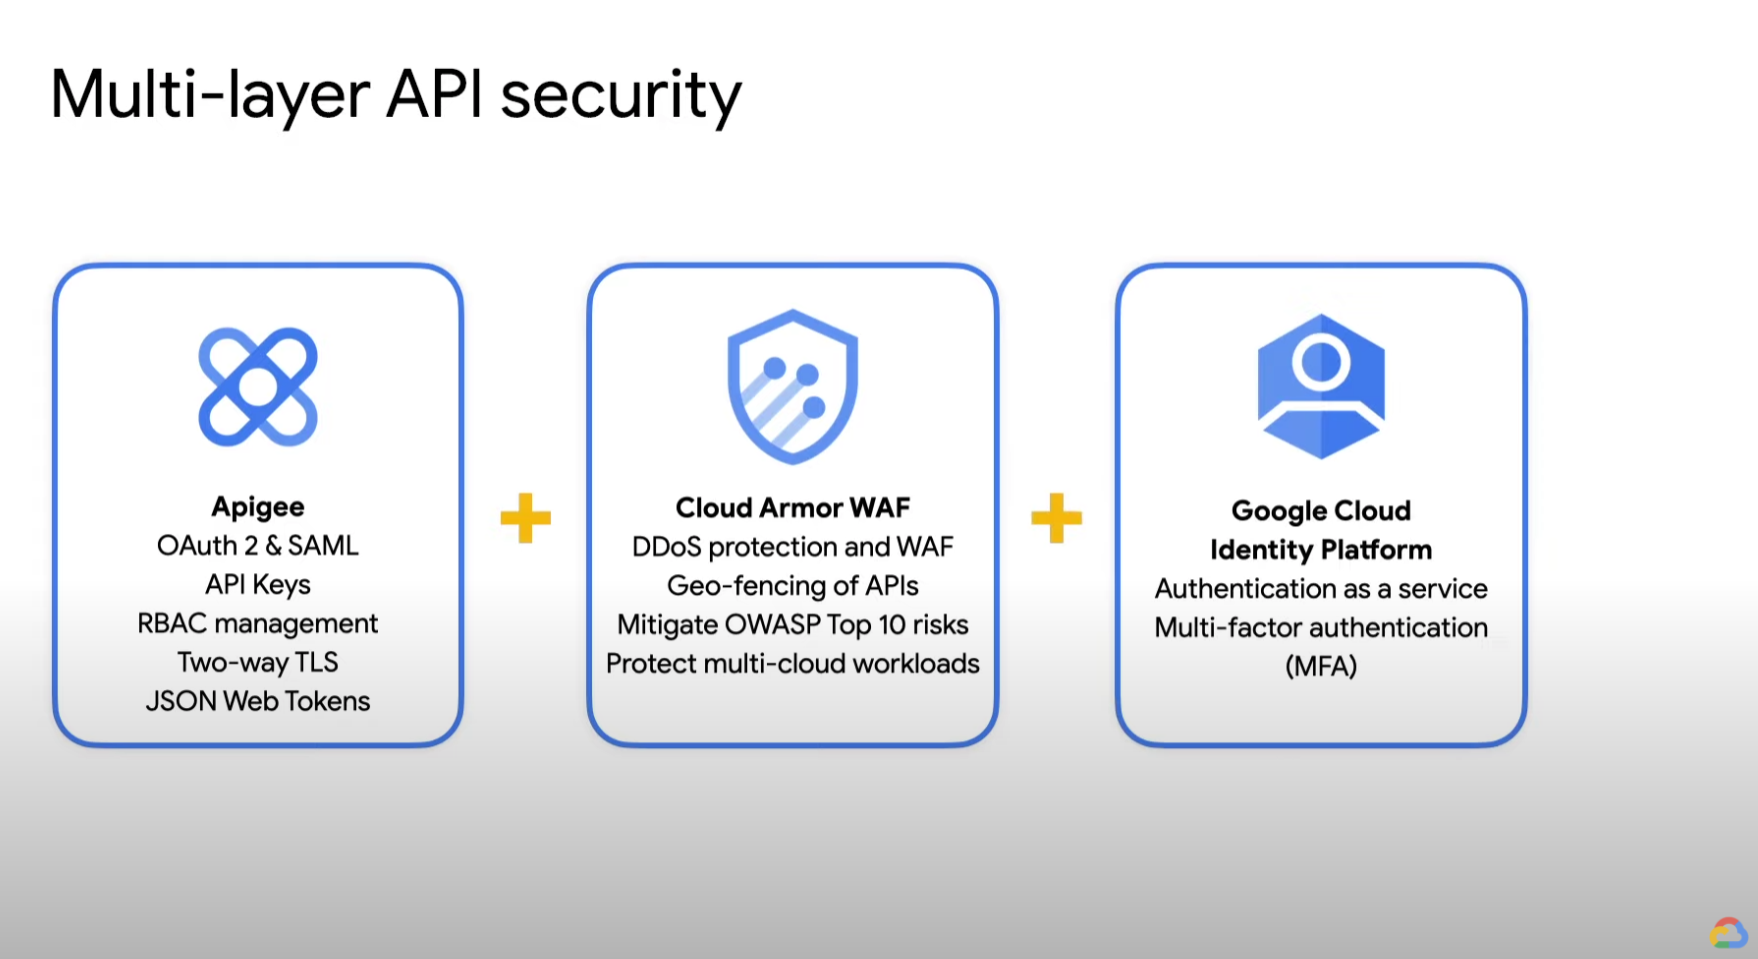 Google Cloud launches Apigee X, the next generation of its API management platform